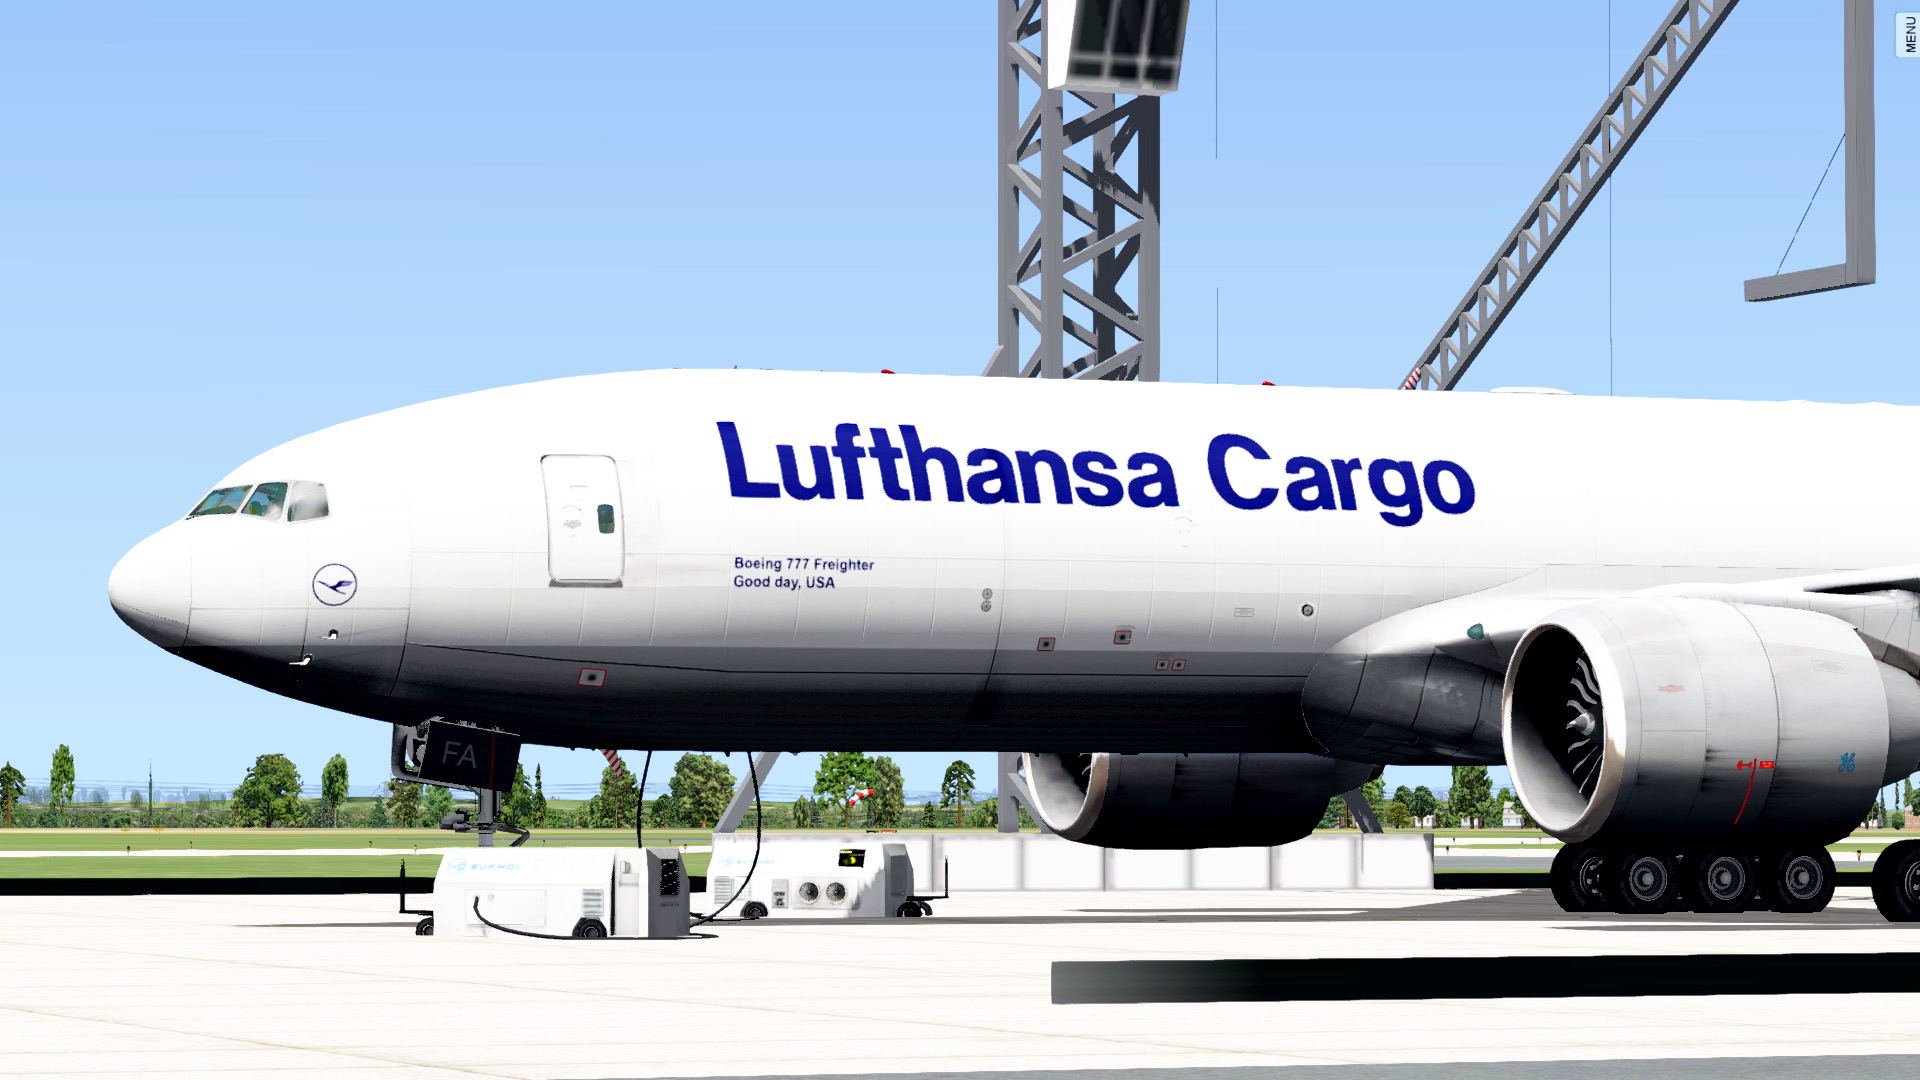 Lufthansa Cargo - Boeing 777-200F - Aircraft Skins